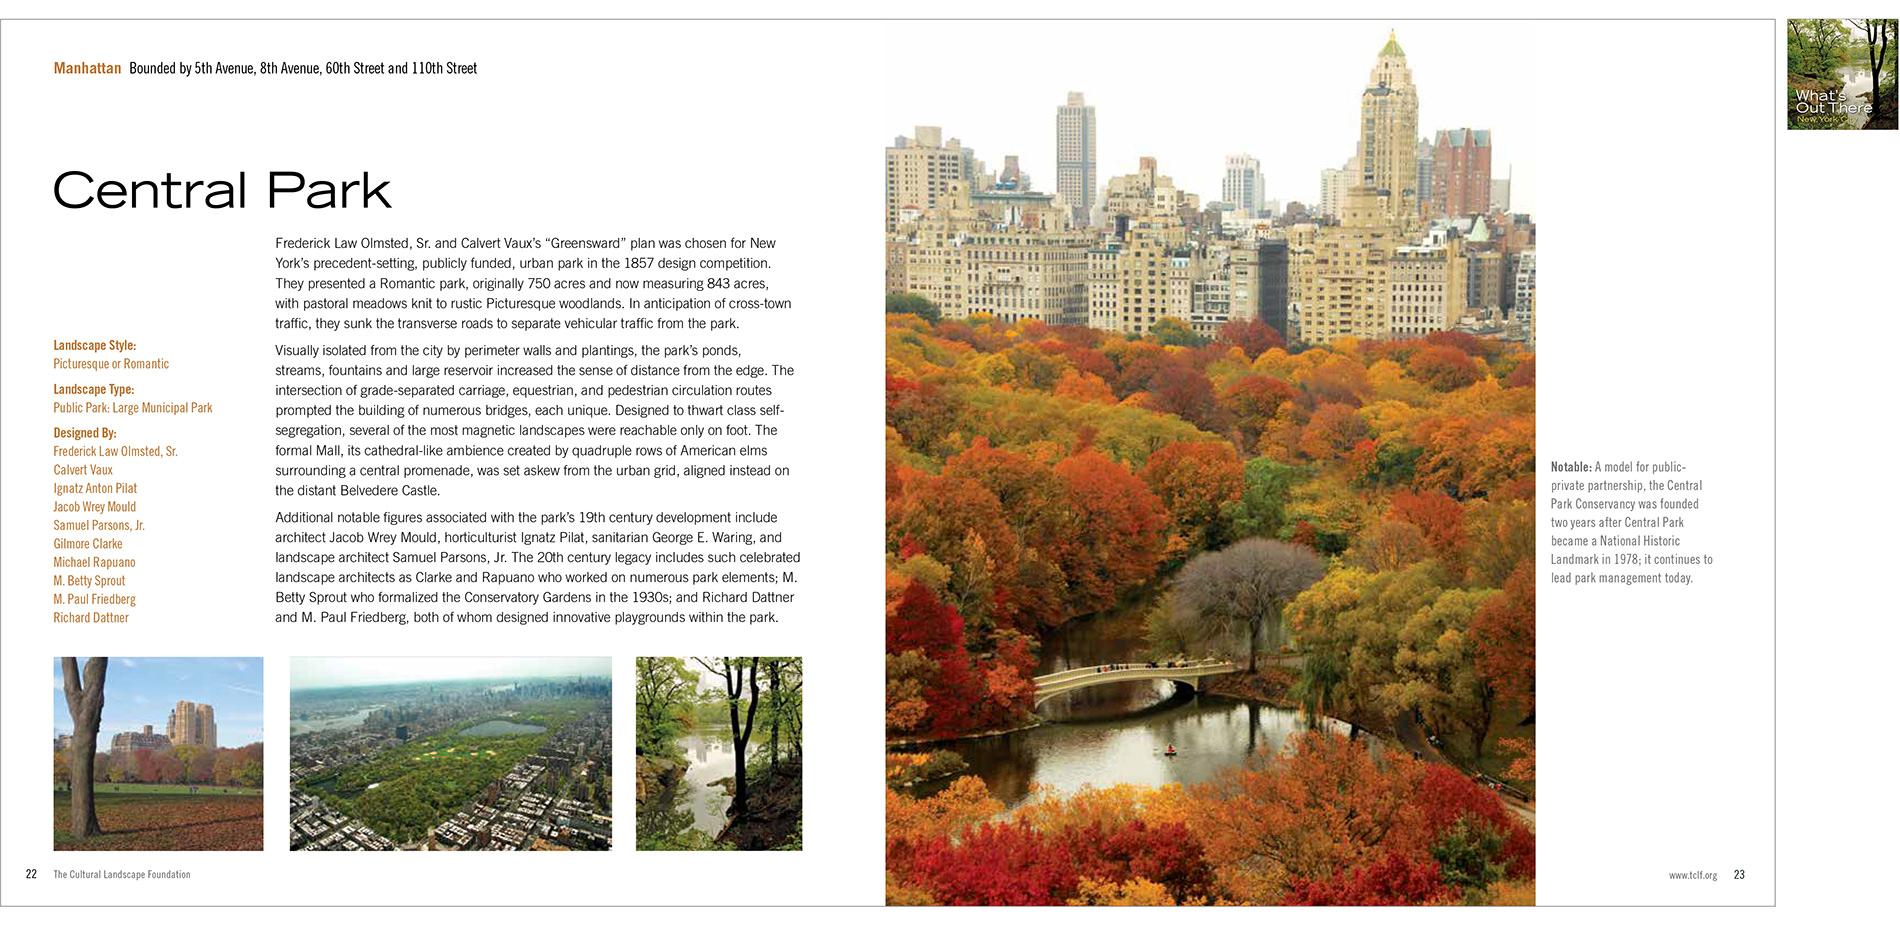 009 Essay Example Landscape Architecture Wot 3 Stunning Argumentative Topics Full